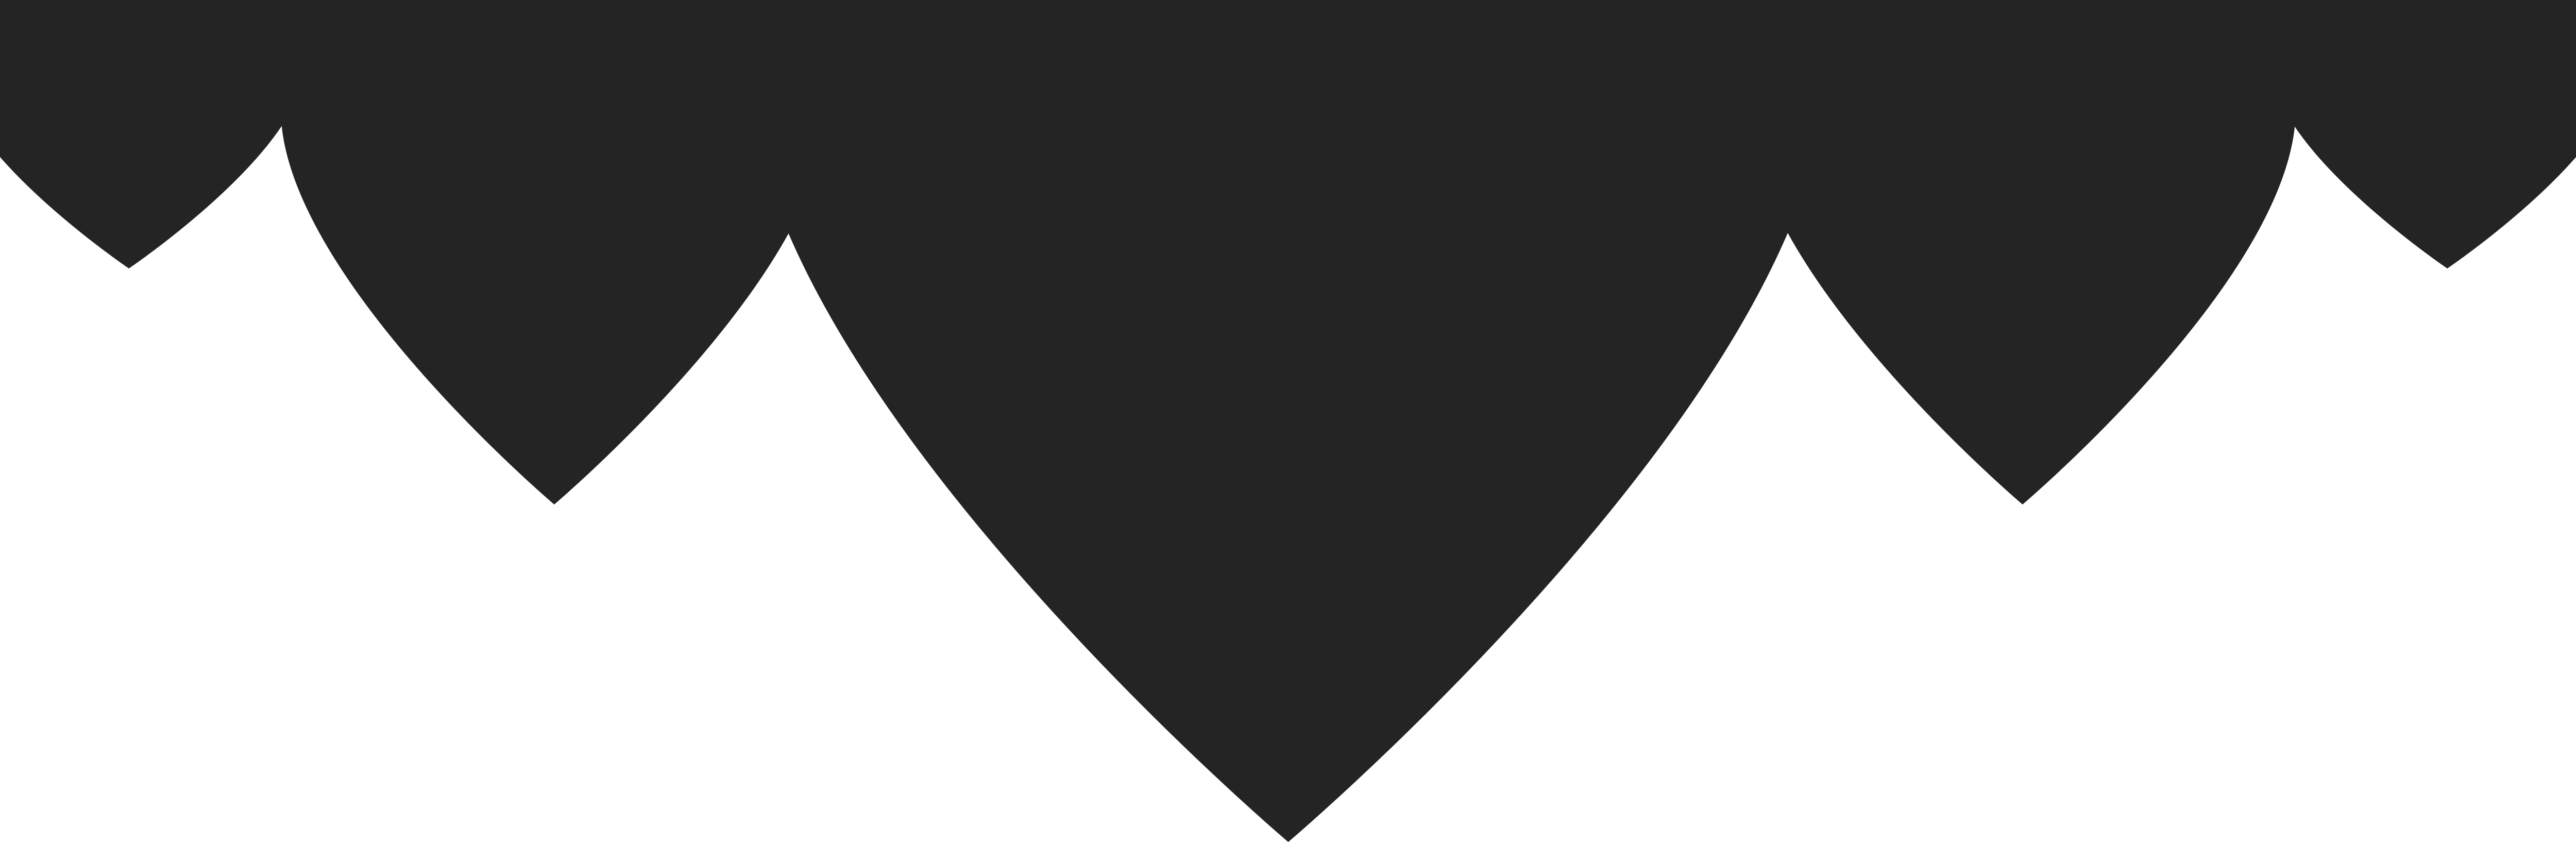 notho leaf border by pride flags on deviantart